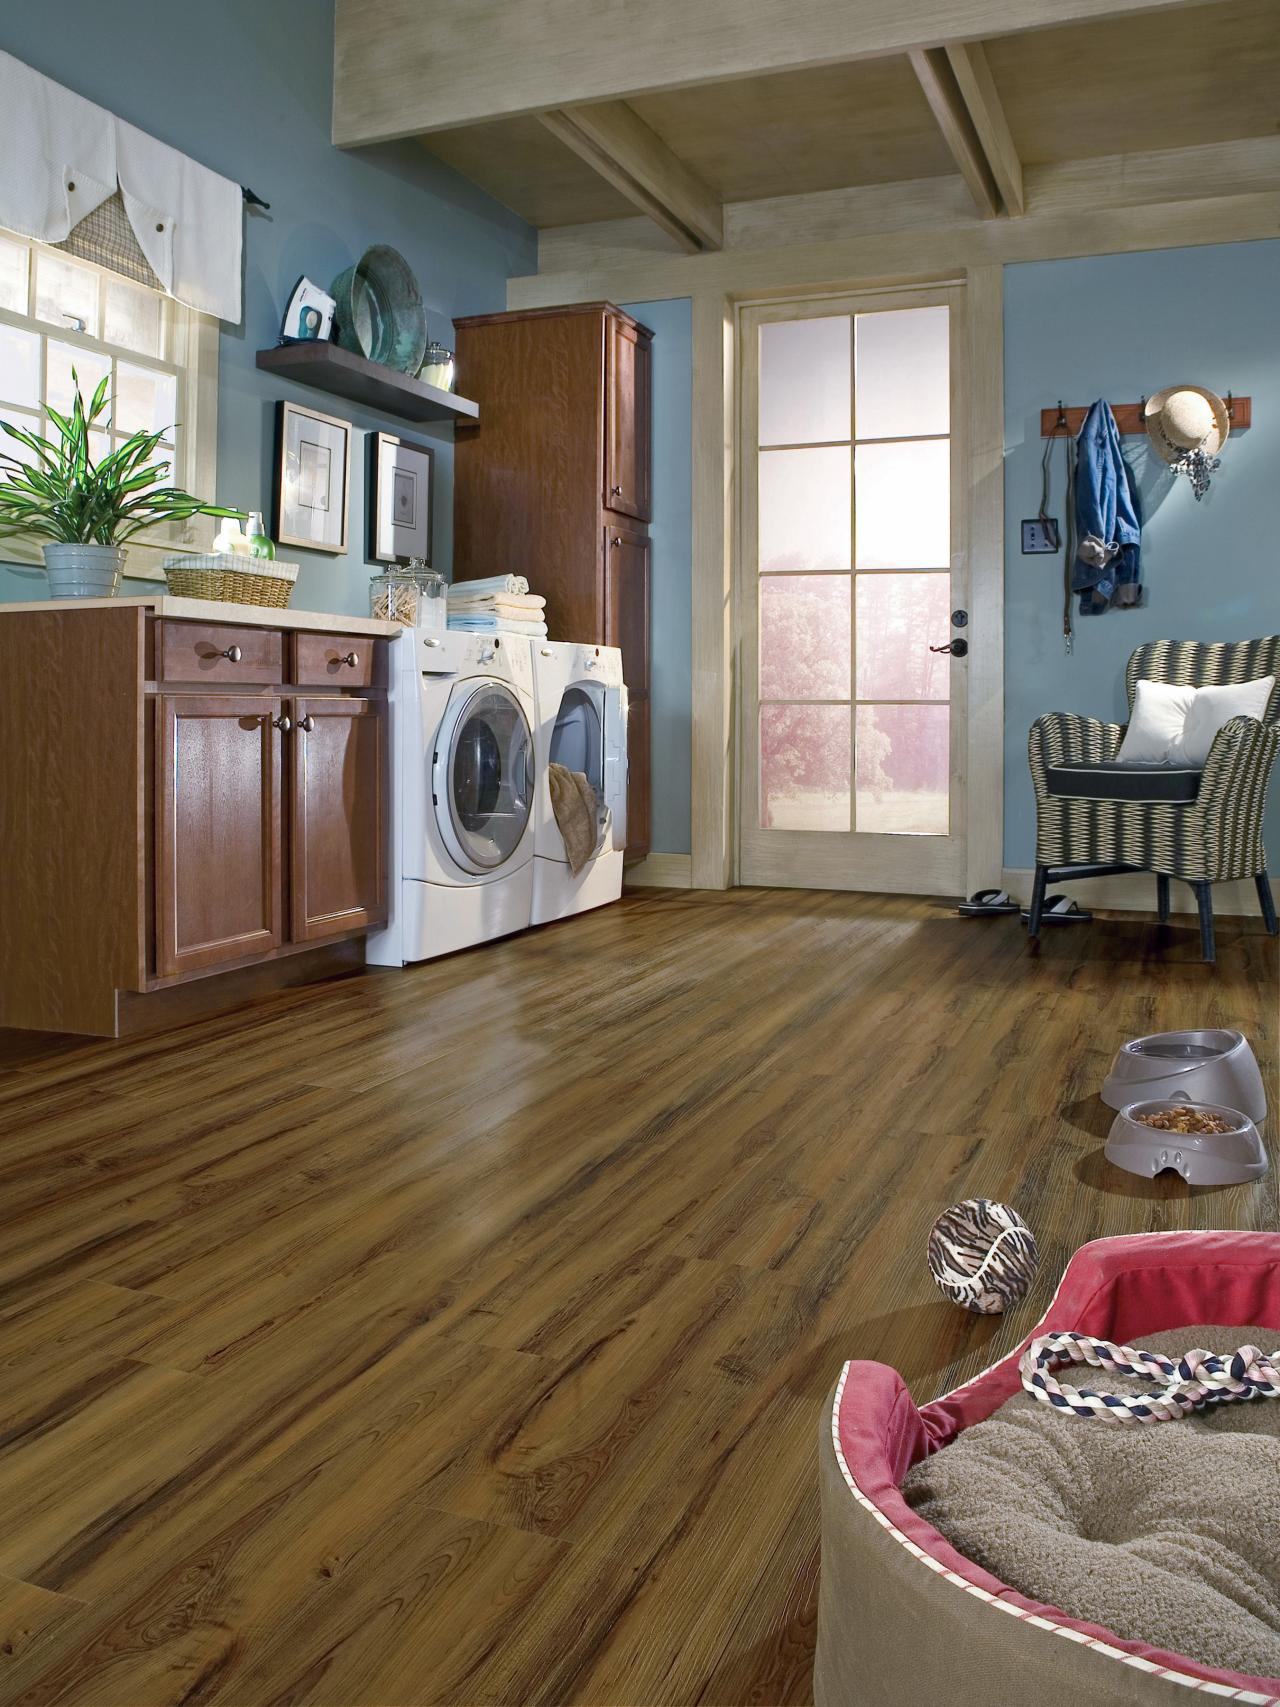 10 Clever Storage Ideas For Your Tiny Laundry Room | HGTVu0027s Decorating U0026  Design Blog | HGTV